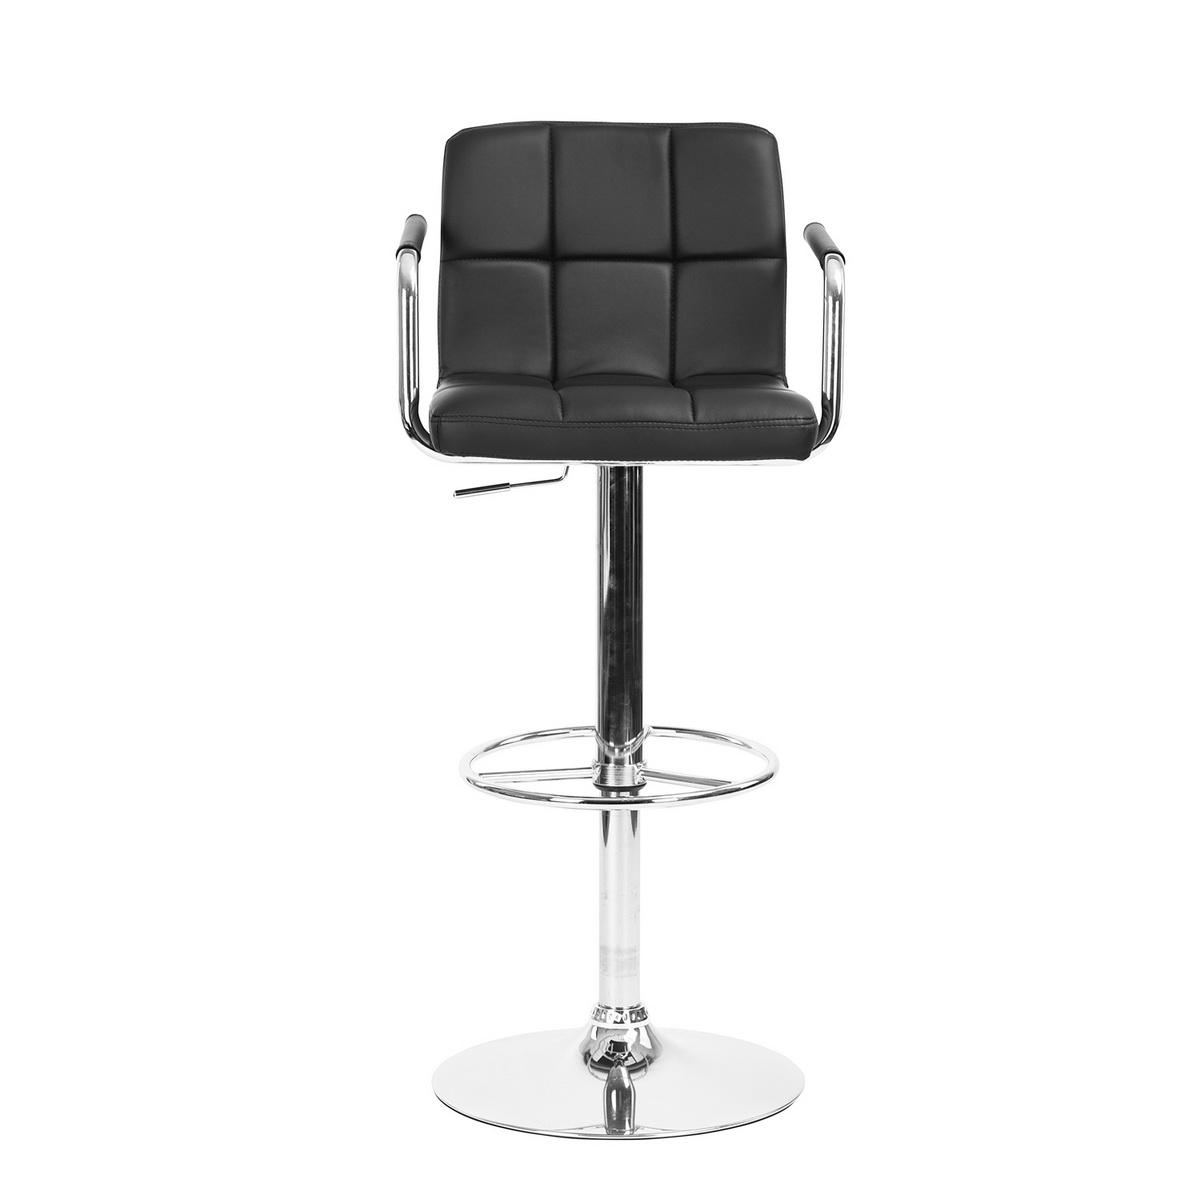 tabouret de bar contemporain simili m tal chrom repose. Black Bedroom Furniture Sets. Home Design Ideas